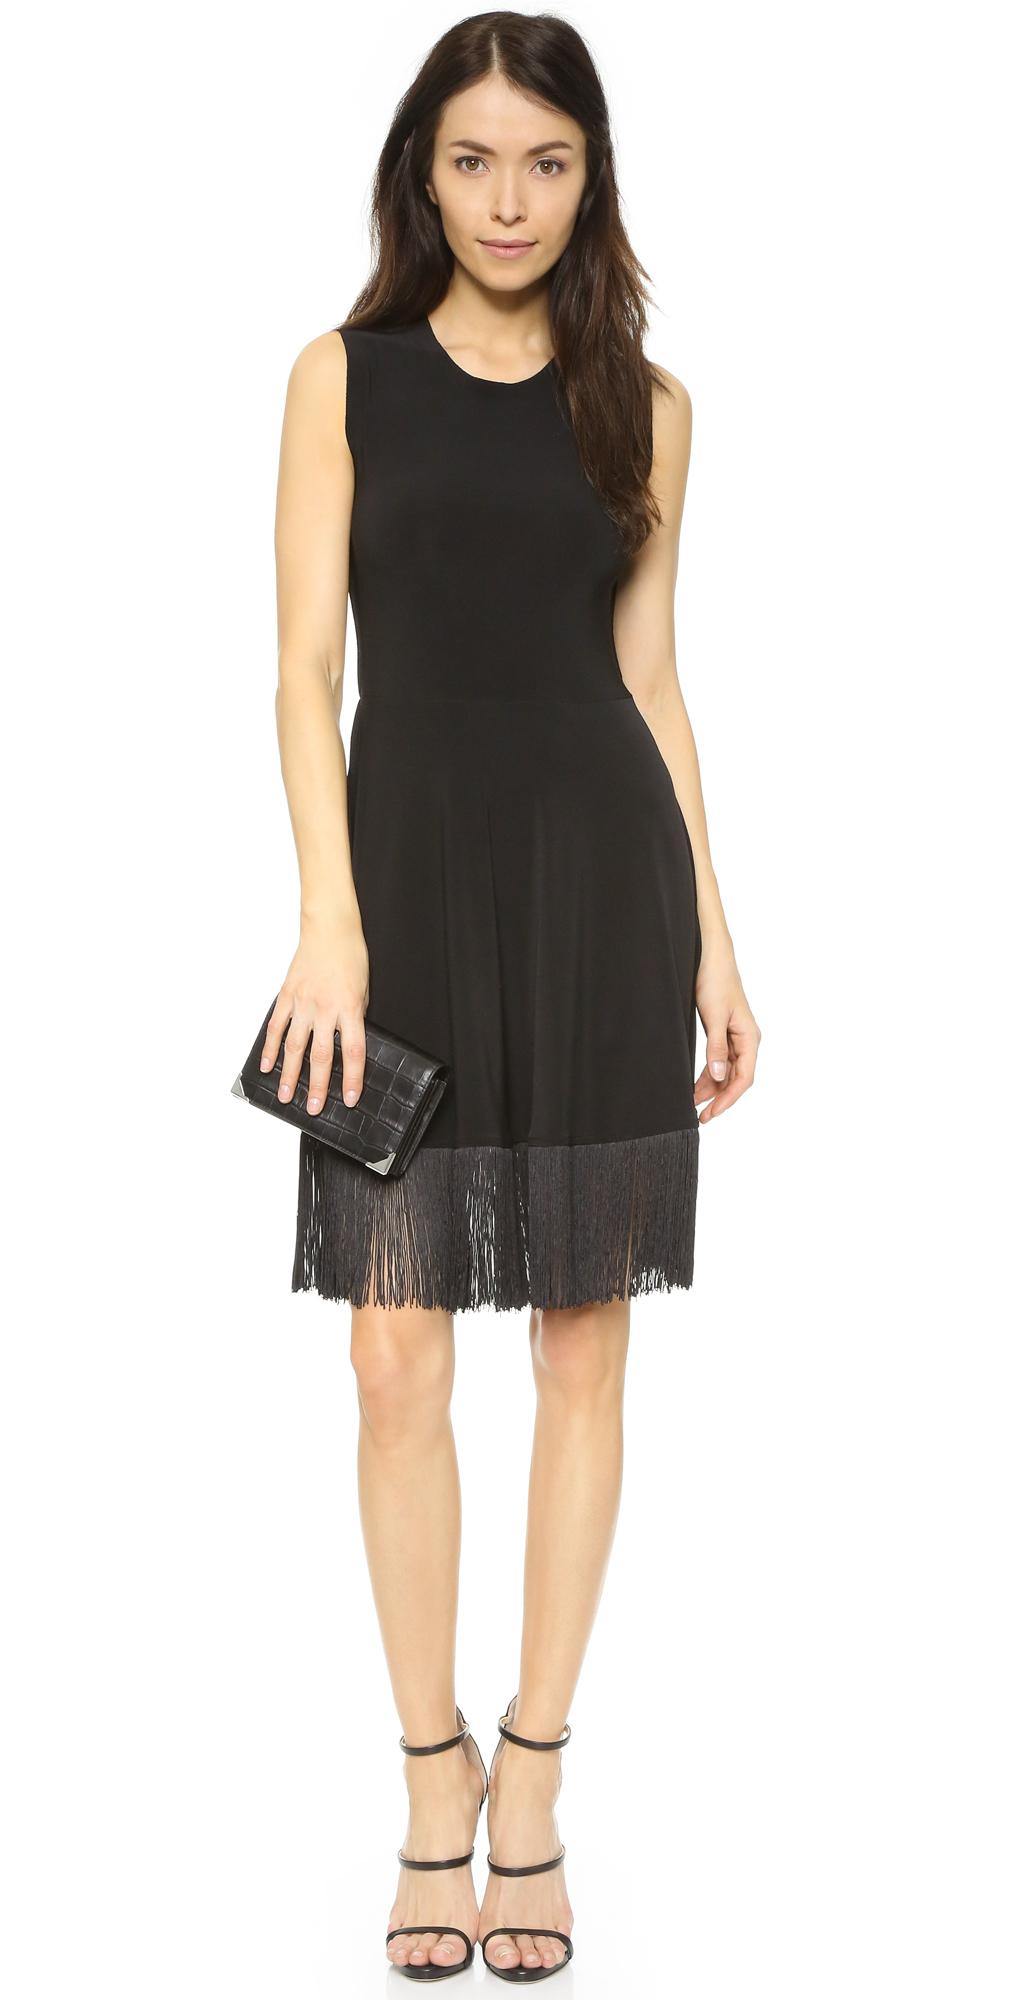 Norma Kamali Womens Lamp Shade Dress